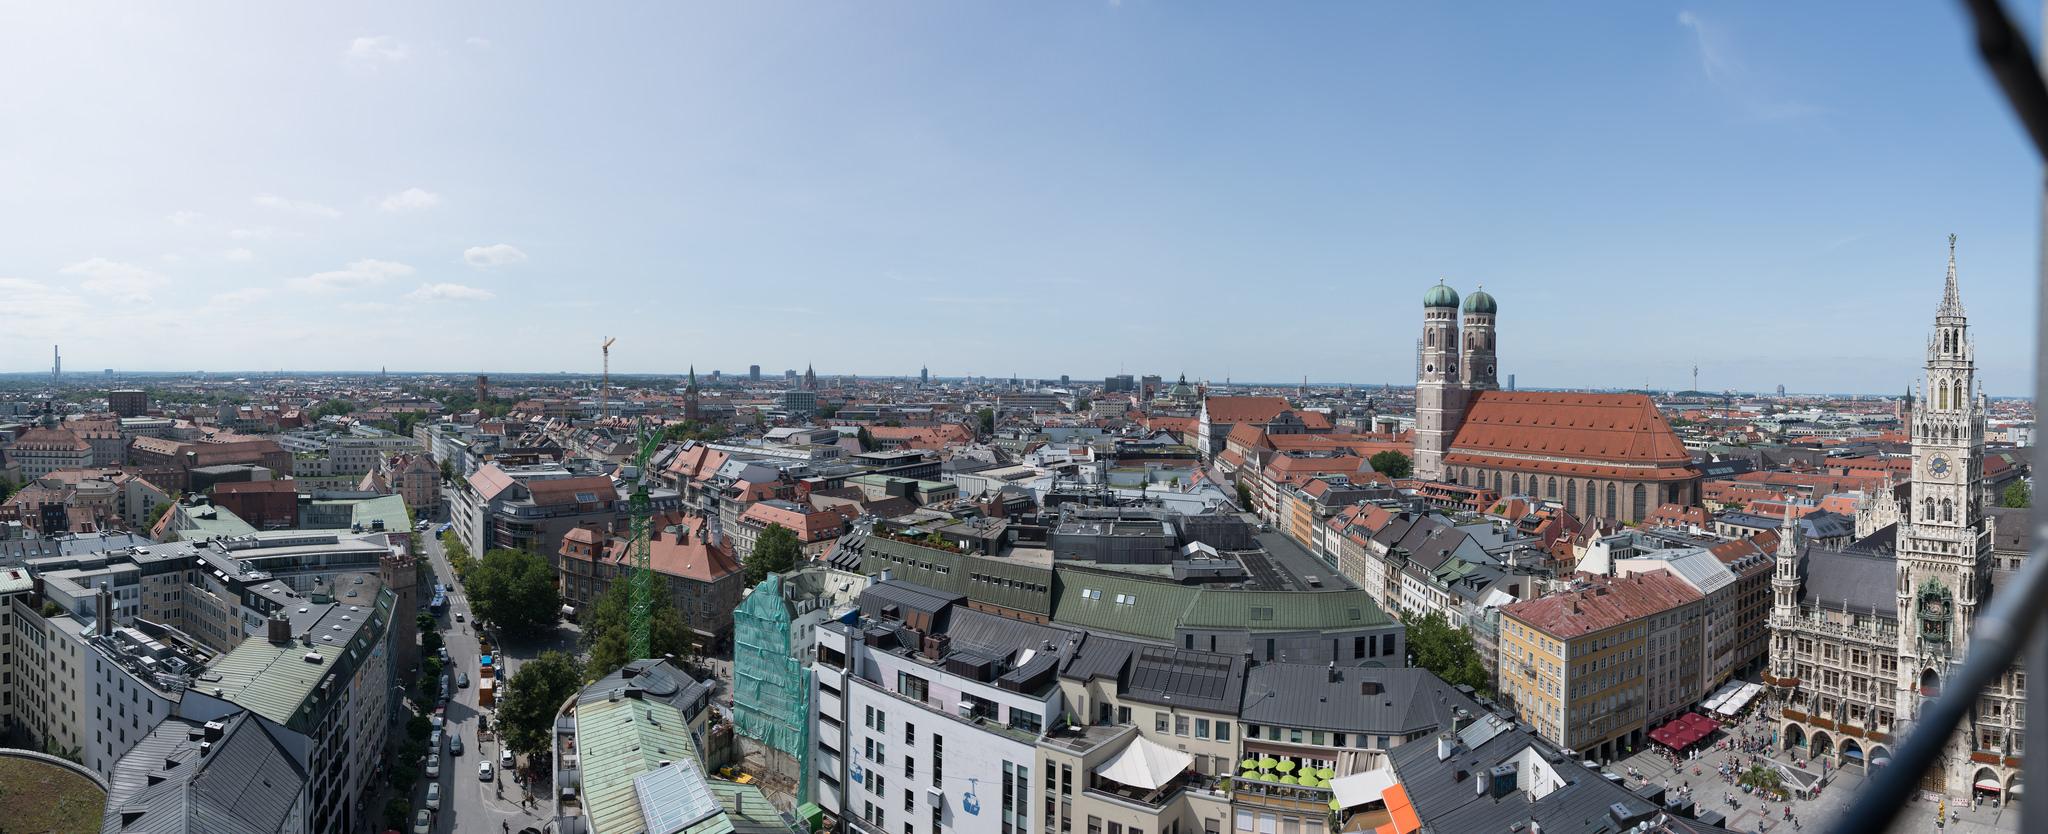 о нас, мюнхен, экскурсии по Баварии, munich travel, flickr